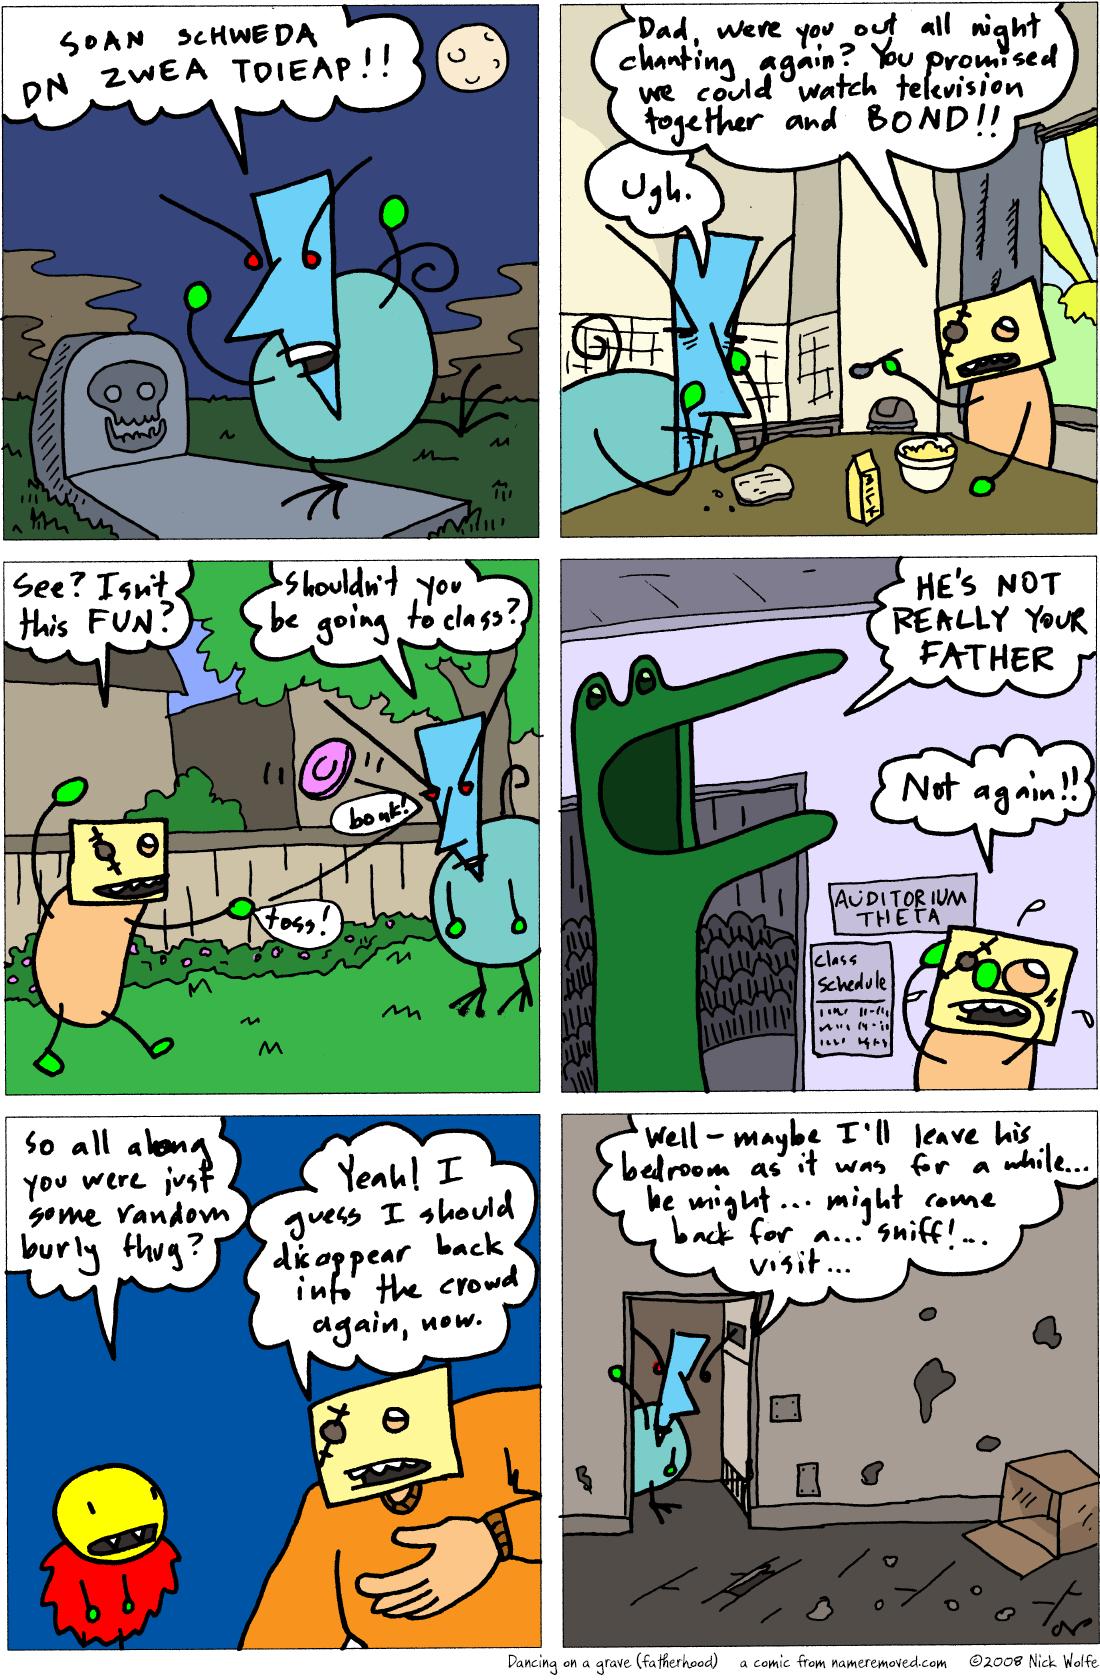 Dancing on a grave (fatherhood)